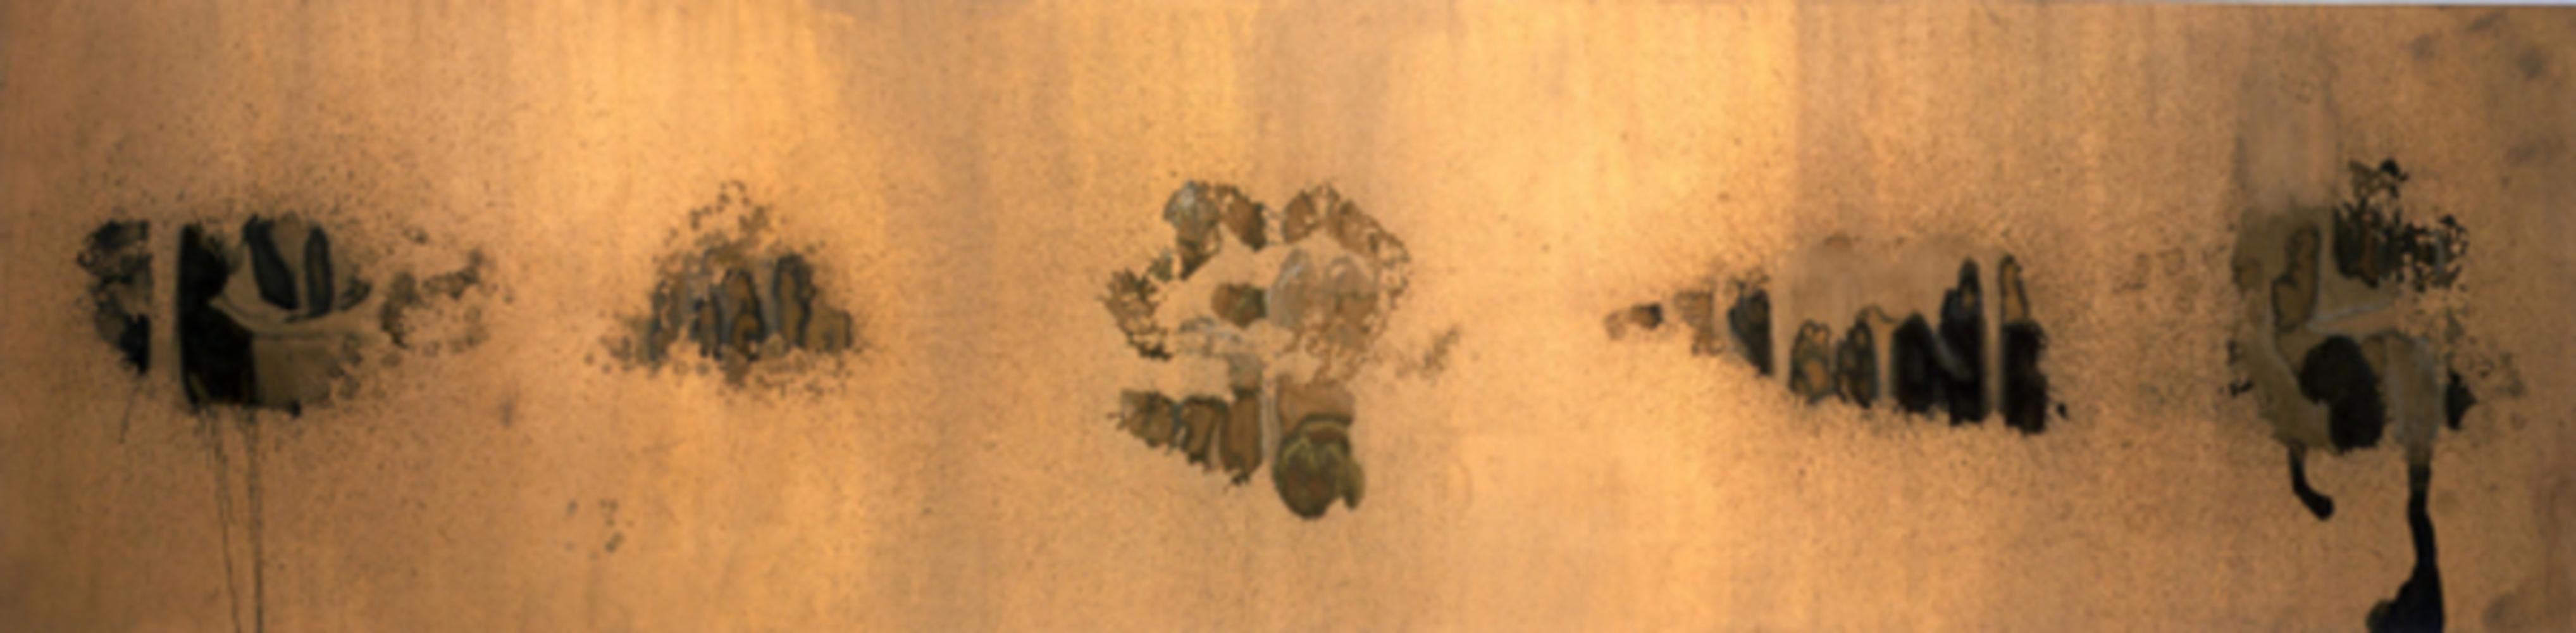 Oxidation painting 1978.thumb